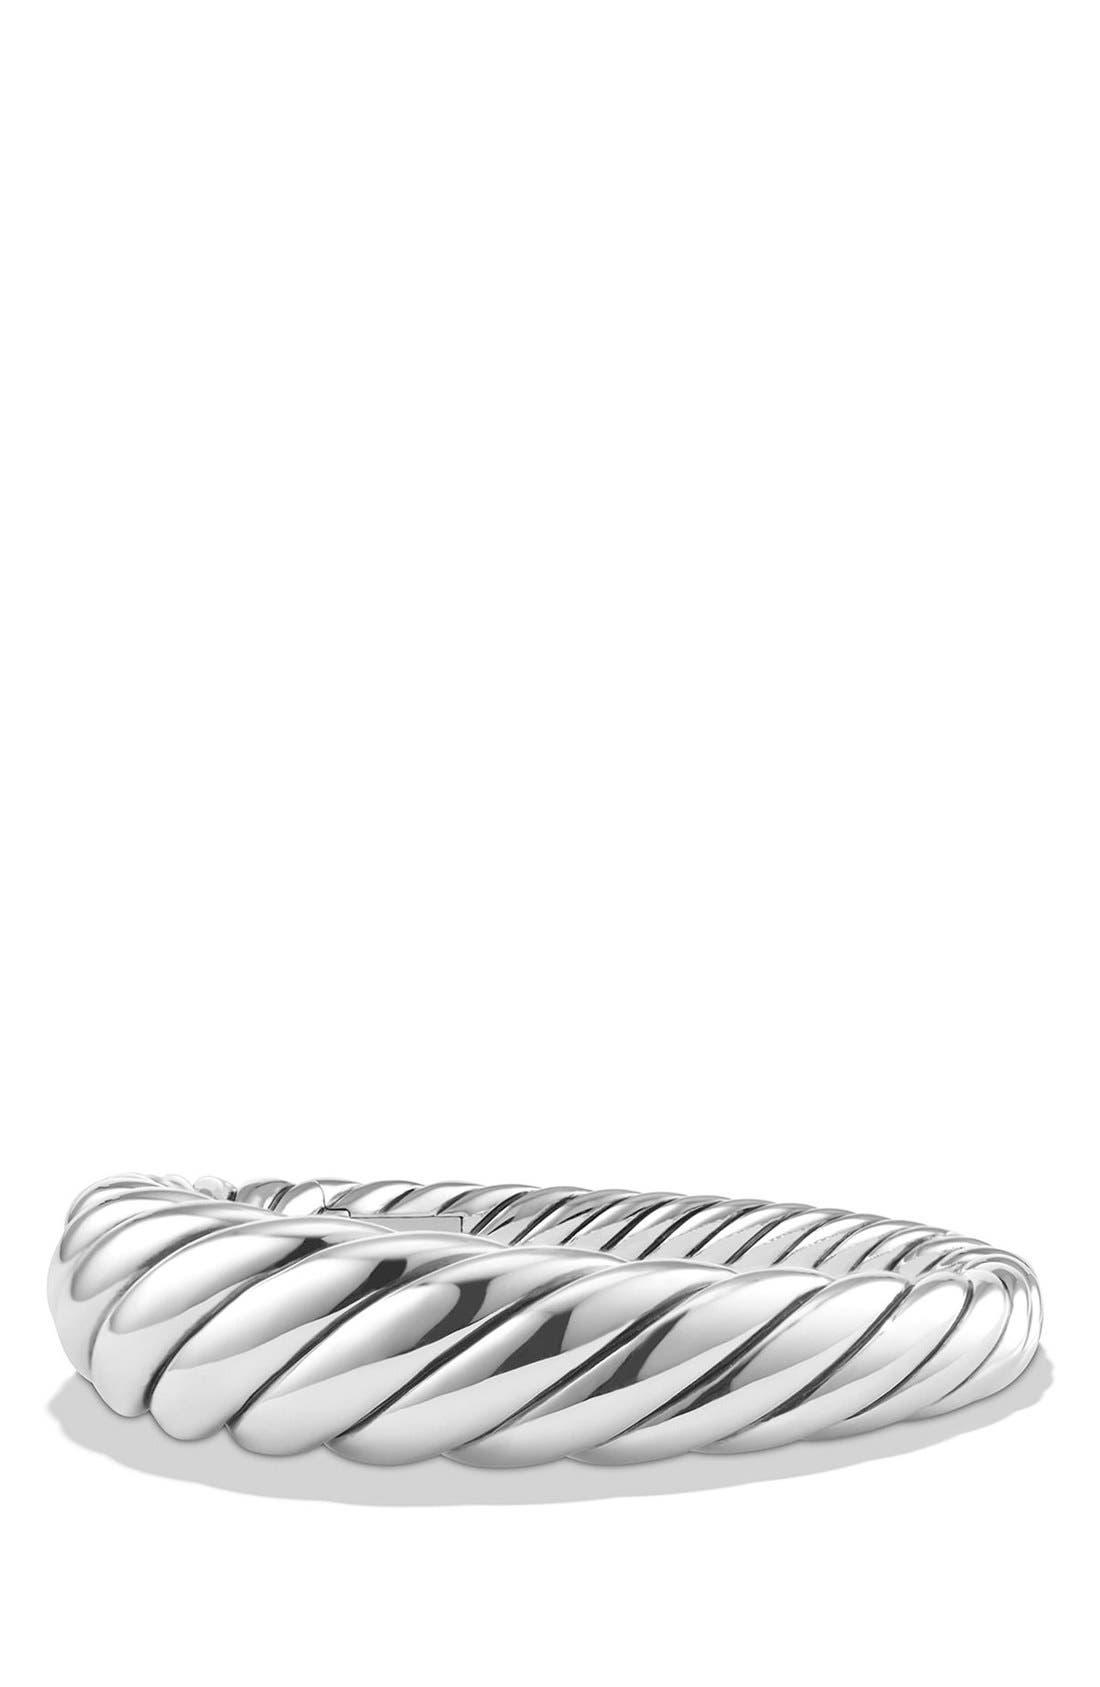 Alternate Image 1 Selected - David Yurman 'Pure Form' Cable Bracelet